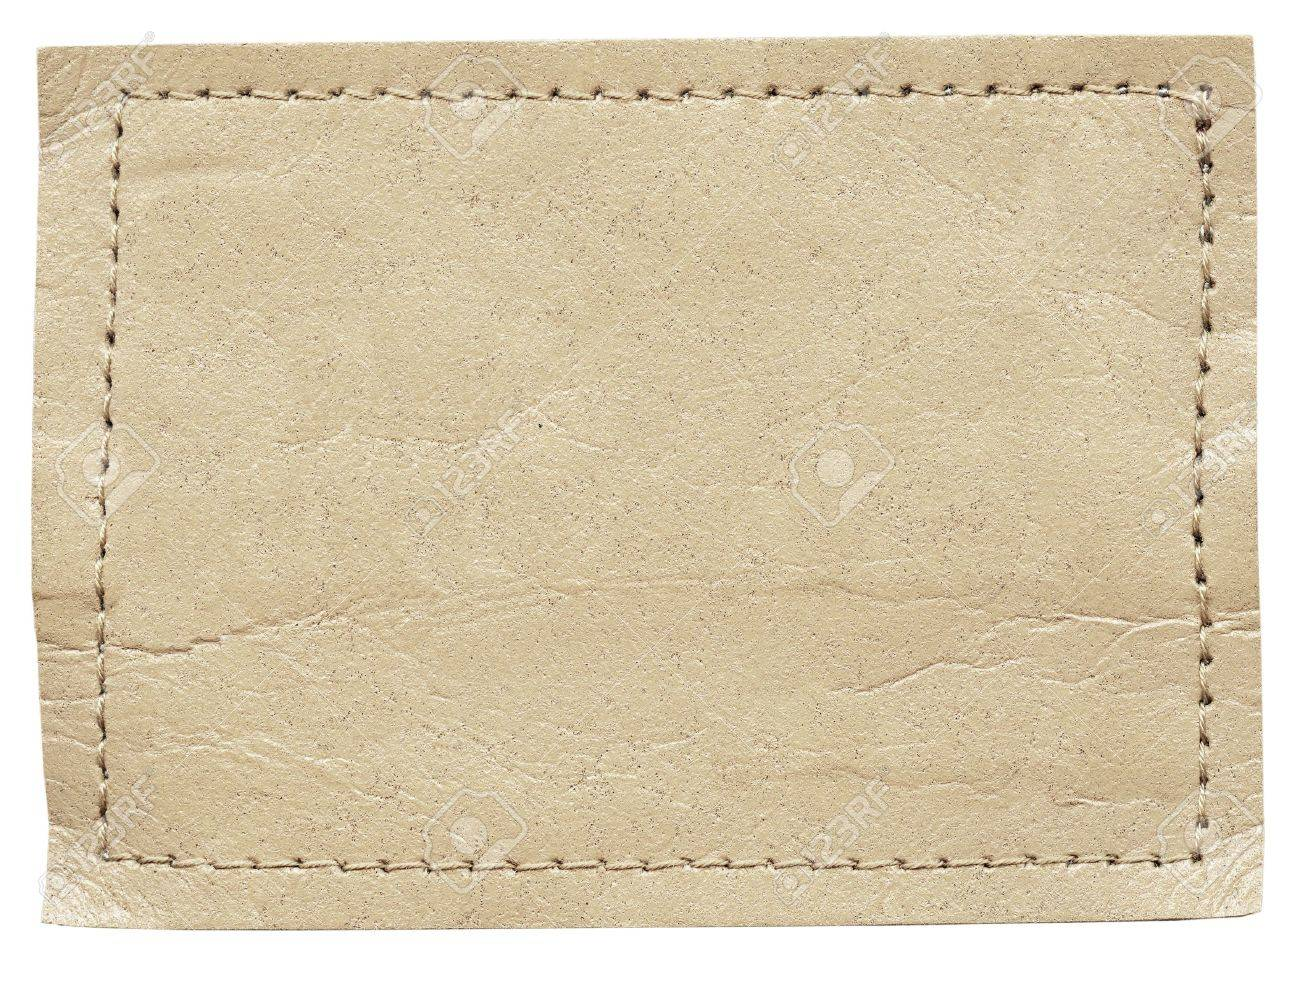 I tag background image - Blank Jeans Label Isolated On White Background Stock Photo 9702749